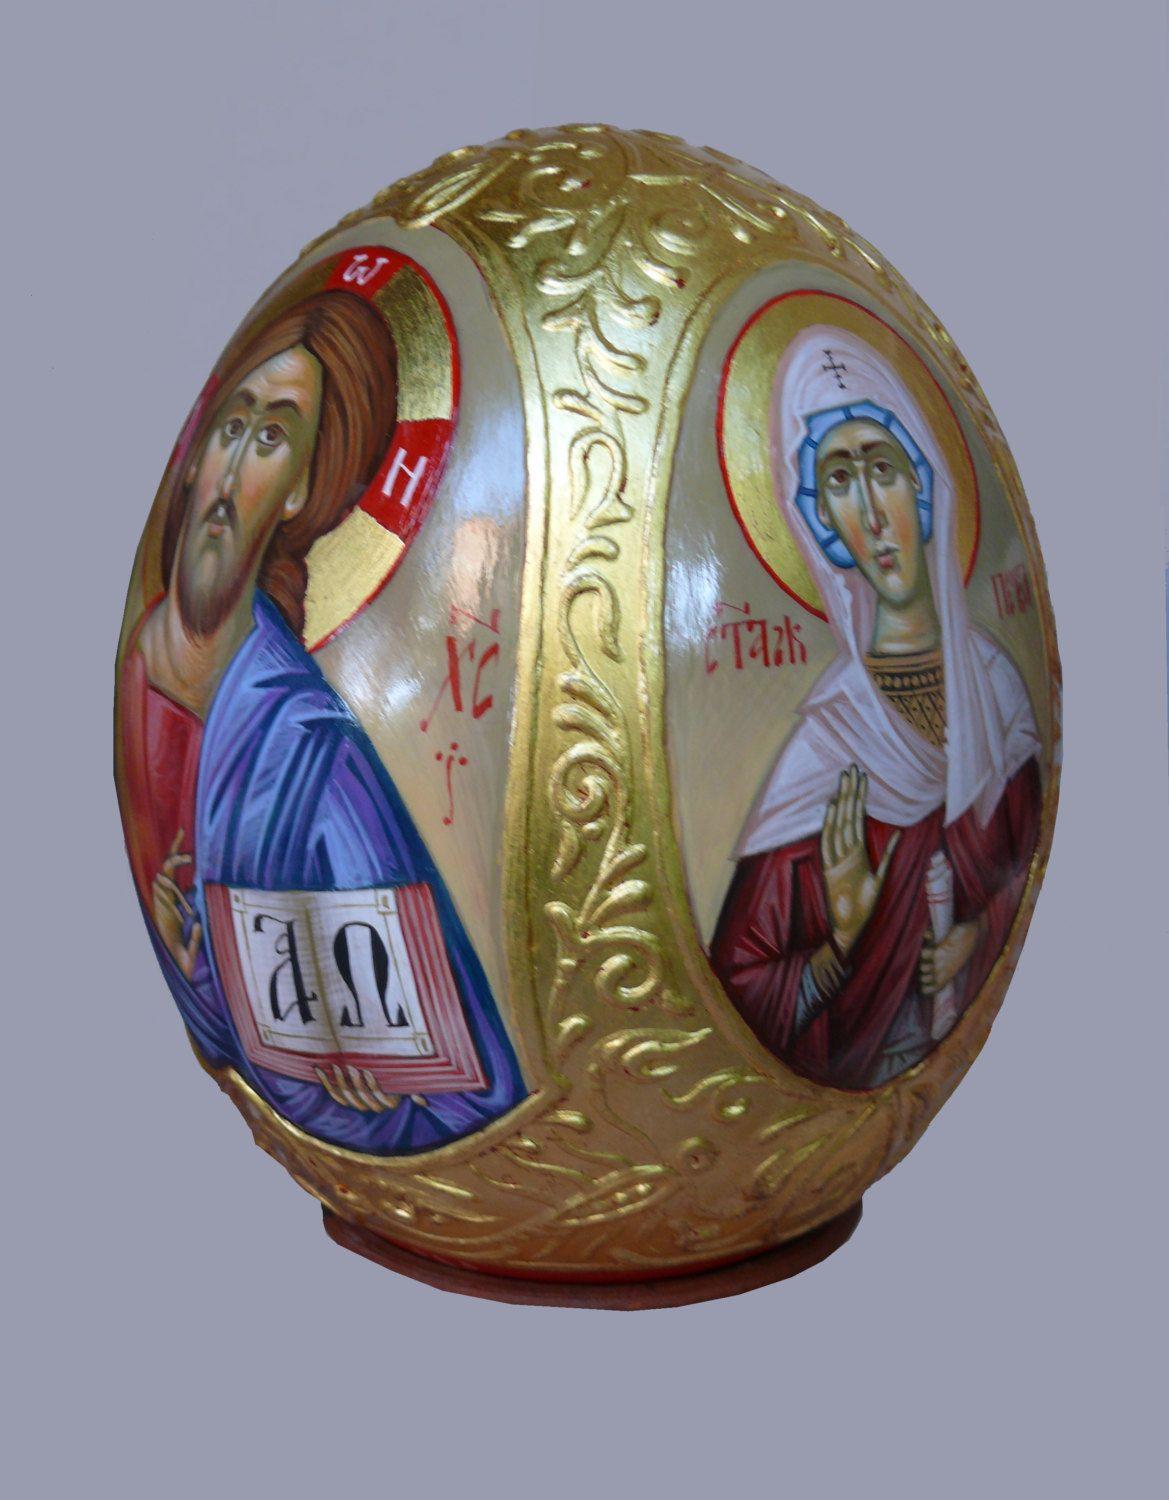 Hand painted ostrich egg egg icon easter gift orthodox gifts hand painted ostrich egg egg icon easter gift orthodox gifts orthodox icon painted egg byzantine art religious art christian gift negle Images